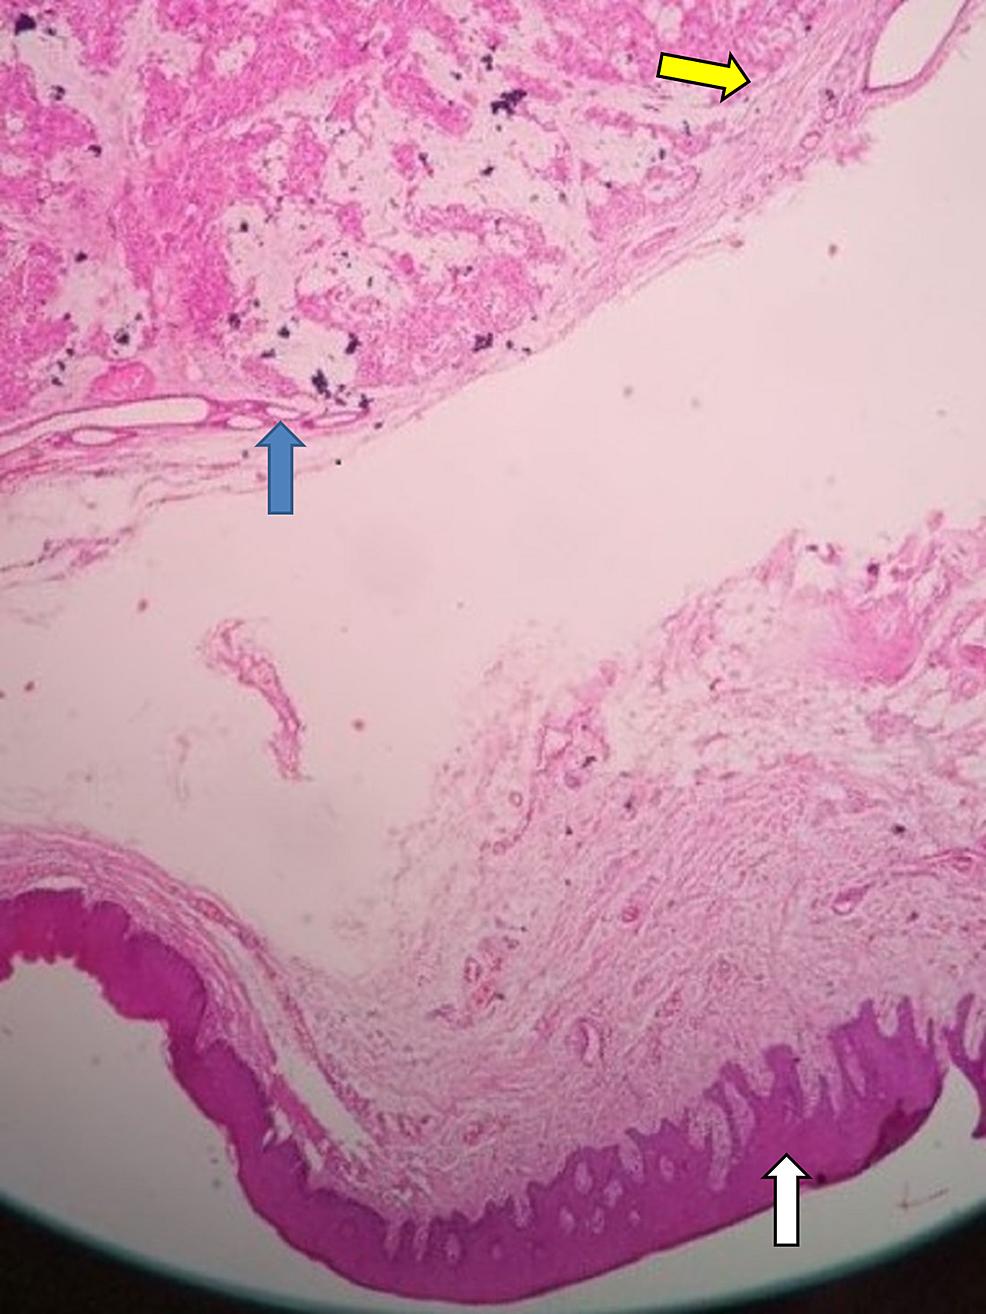 Pleomorphic-adenoma,-histopathological-examination.-Blue-arrow-denotes-islands-of-myoepithelial-cells;-yellow-arrow-denotes-mesenchymal-connective-tissue-layers;-white-arrow-denotes-parakeratinized-stratified-squamous-epithelium.